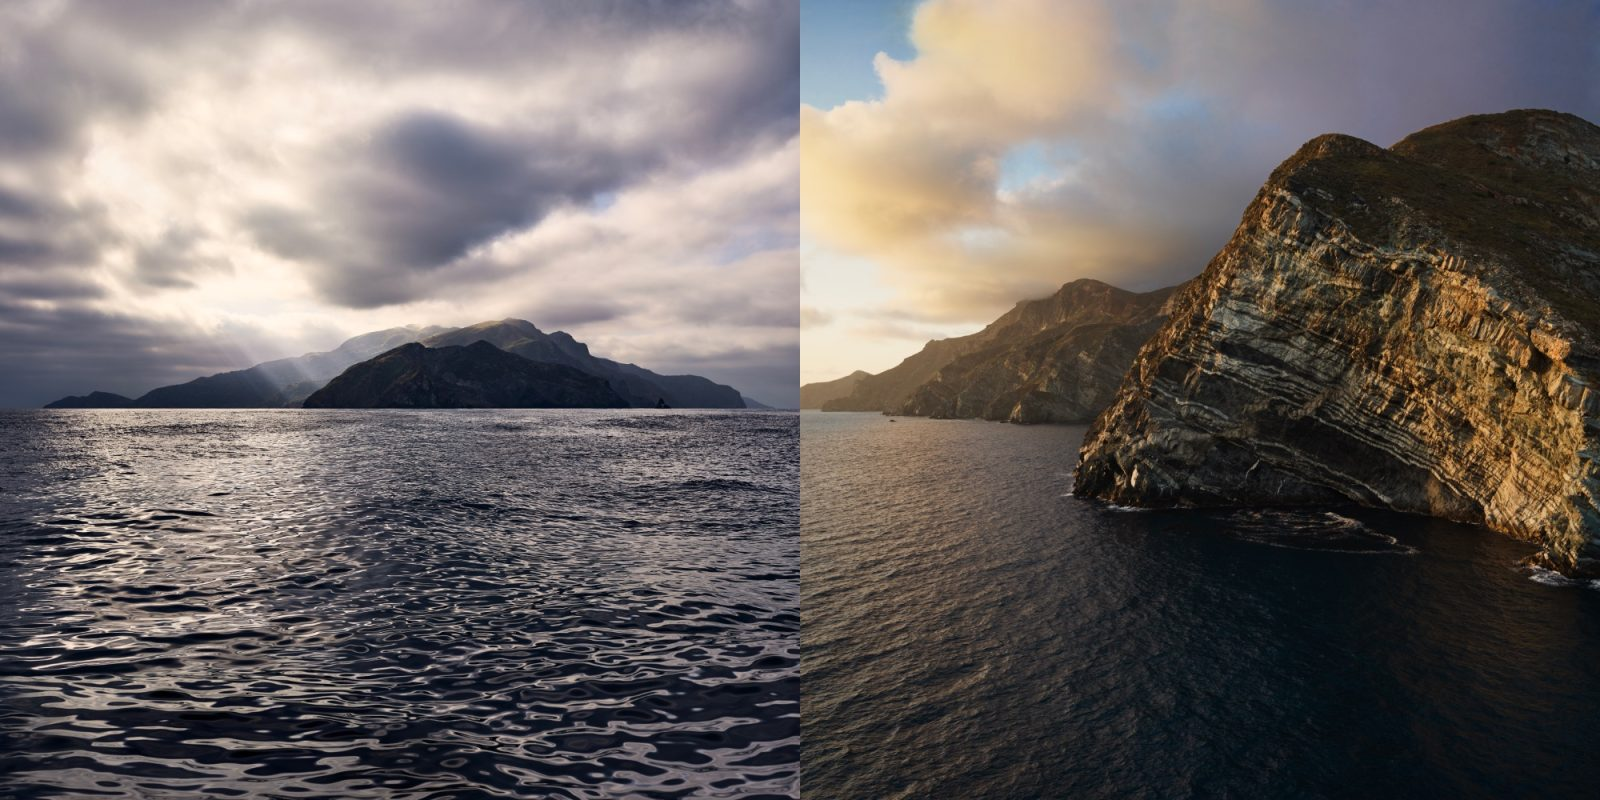 Download 7 new beautiful Catalina desktop wallpapers for macOS 1600x800